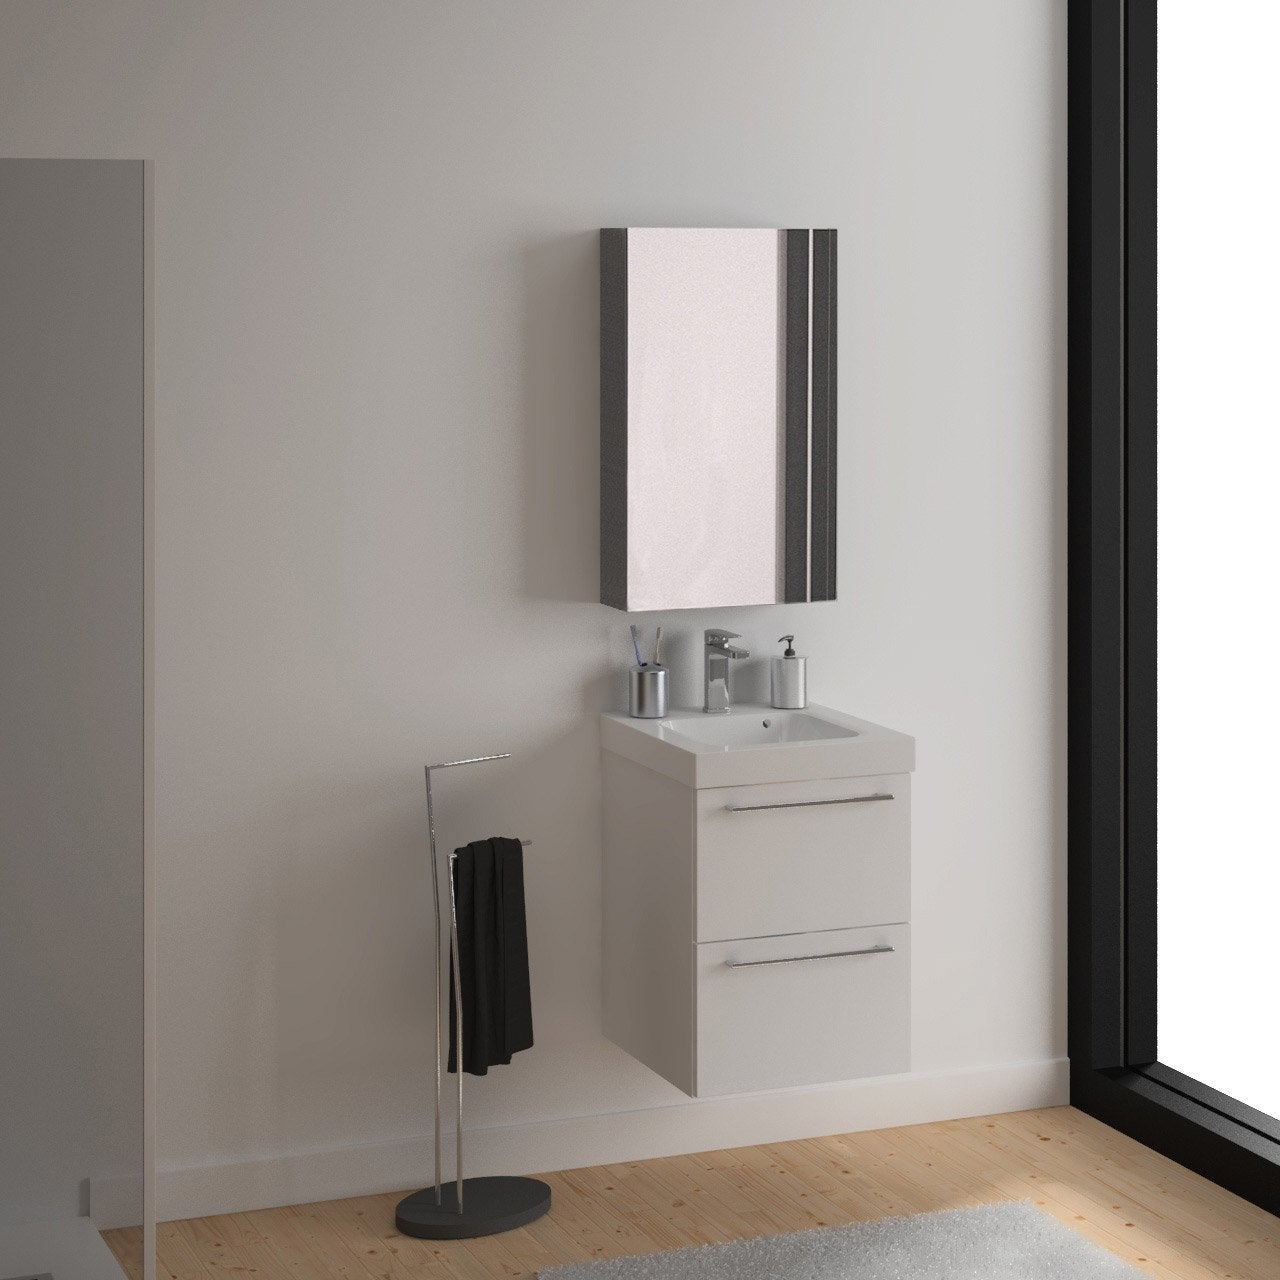 meuble vasque 46 cm blanc remix leroy merlin. Black Bedroom Furniture Sets. Home Design Ideas